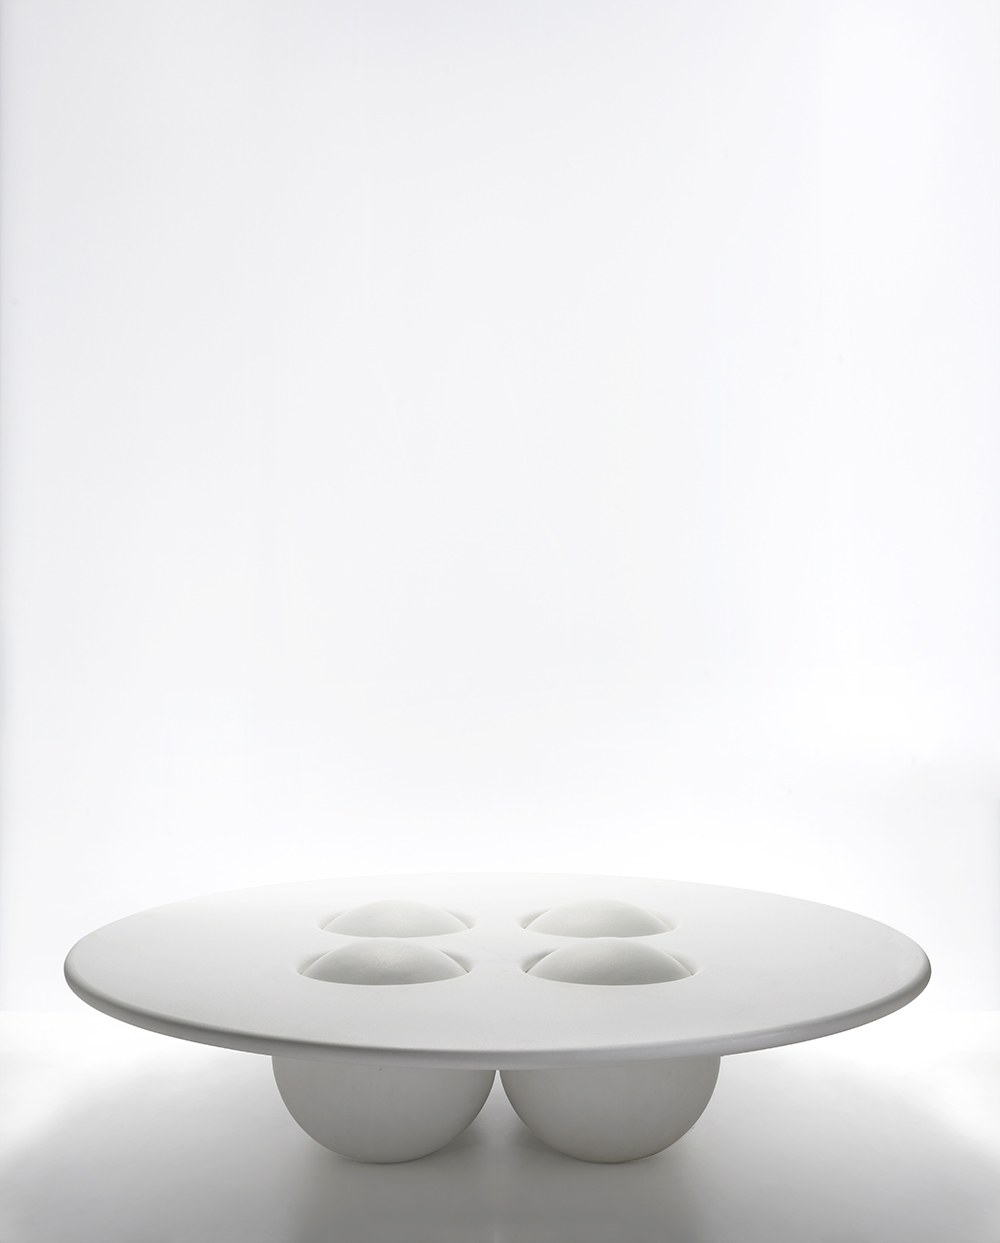 The Kubrick Table